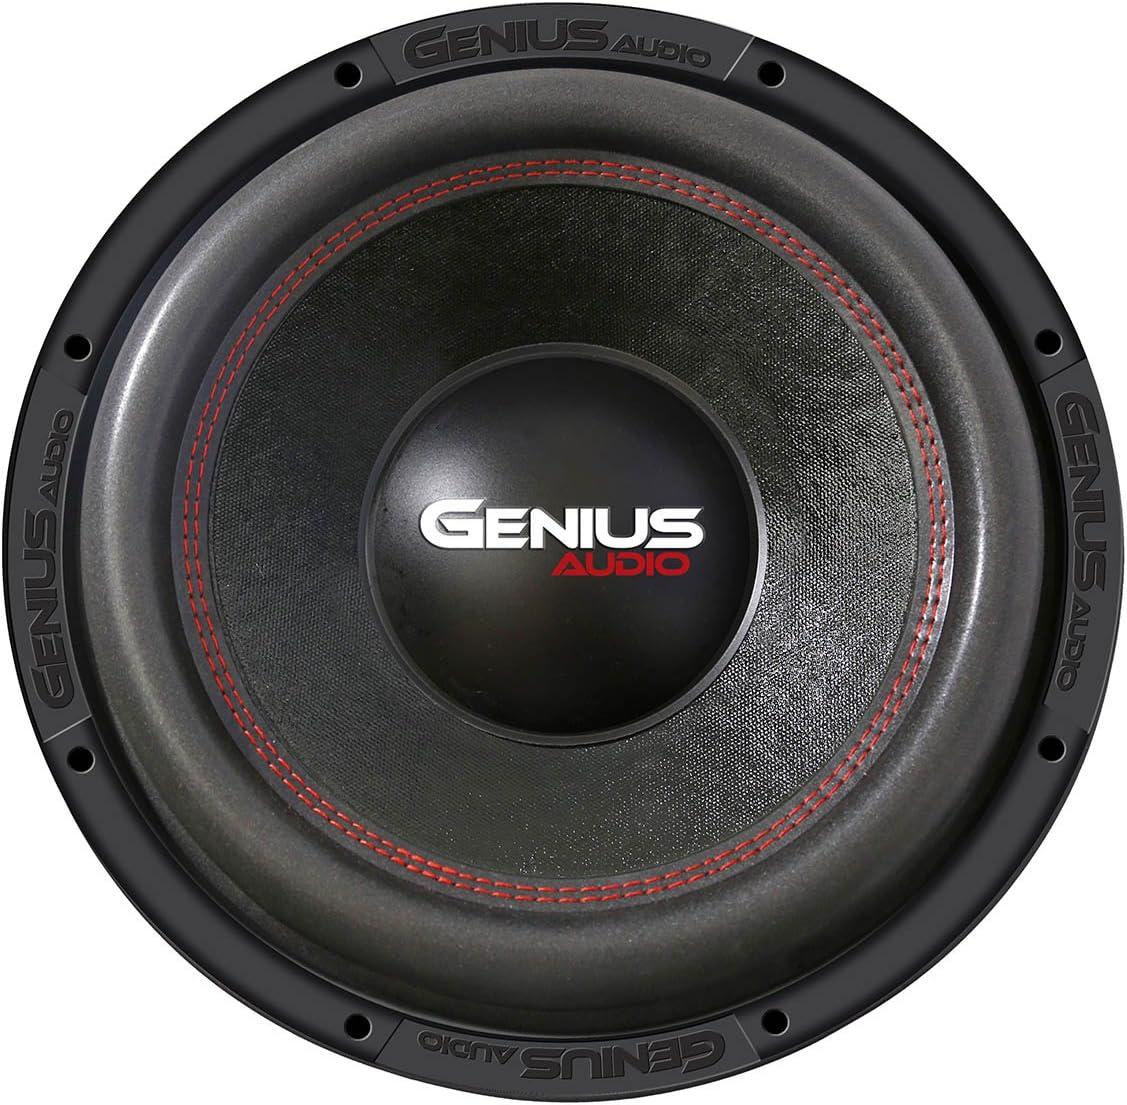 Genius N6-12D4 12 800 Watts-Max Nitro XP Dual 4-Ohms Car Audio Subwoofer